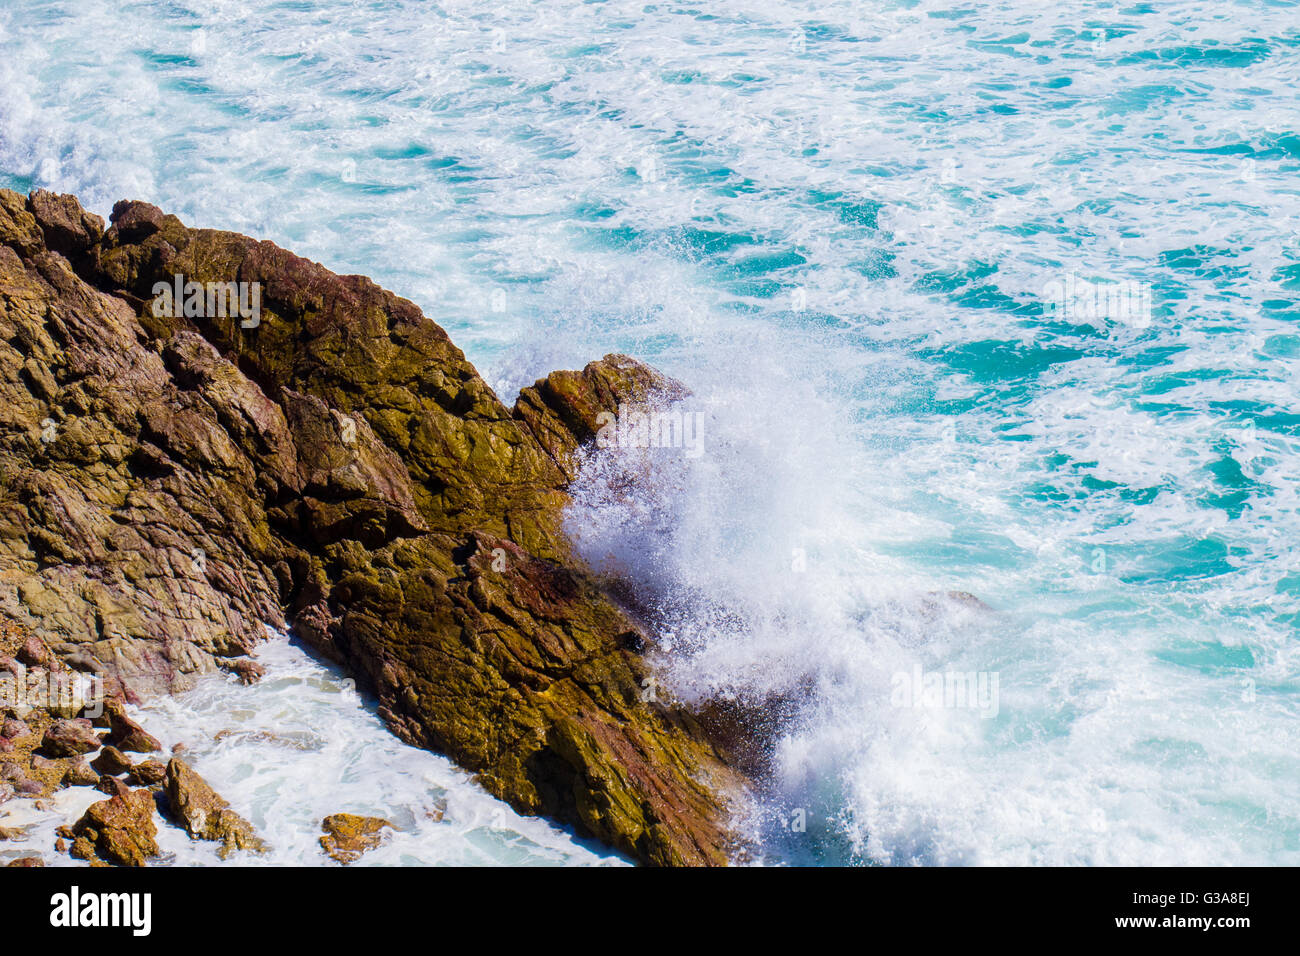 Waves crashing on to rock on the Gold Coast in Australia - Stock Image